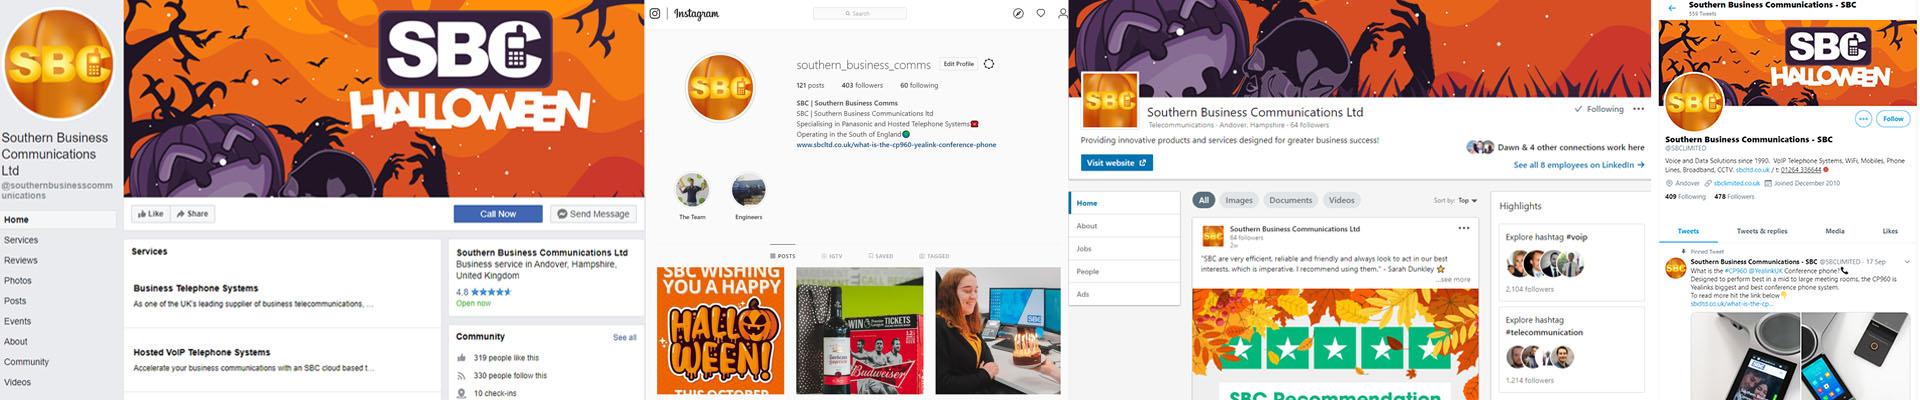 SBC Instagram Facebook LinkedIn and Twitter Halloween Re-brand